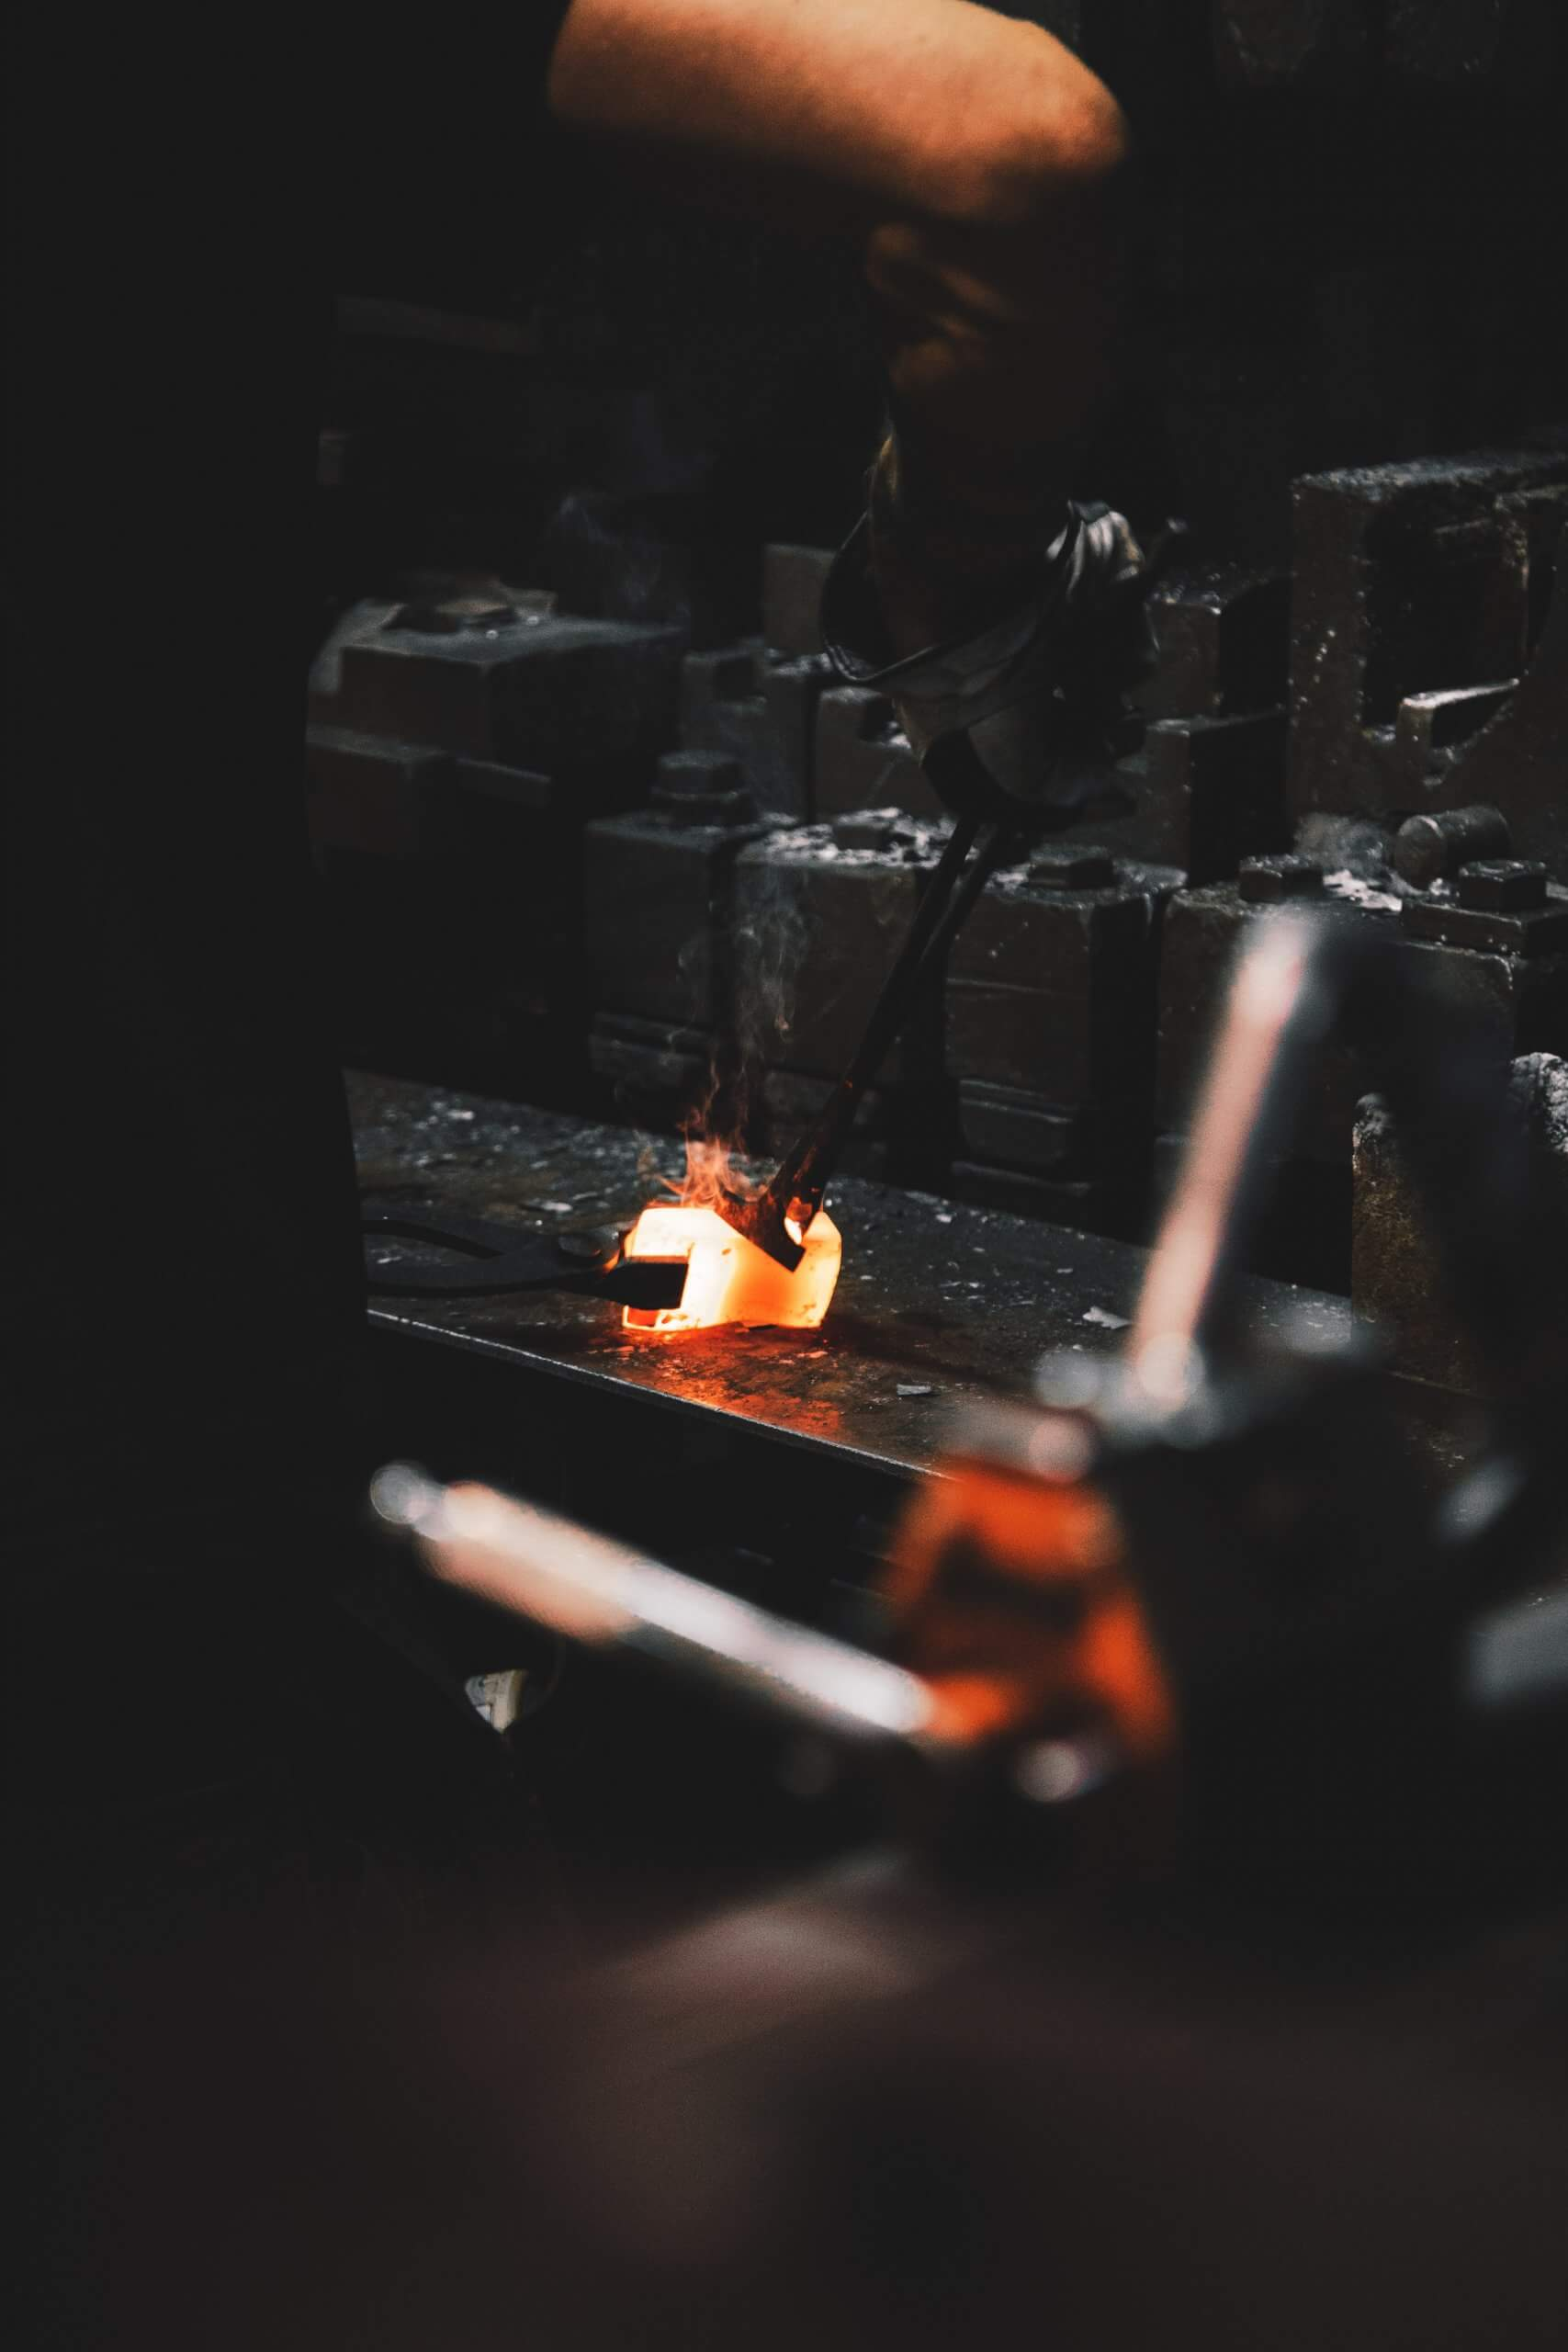 opracovanie kovu scaled